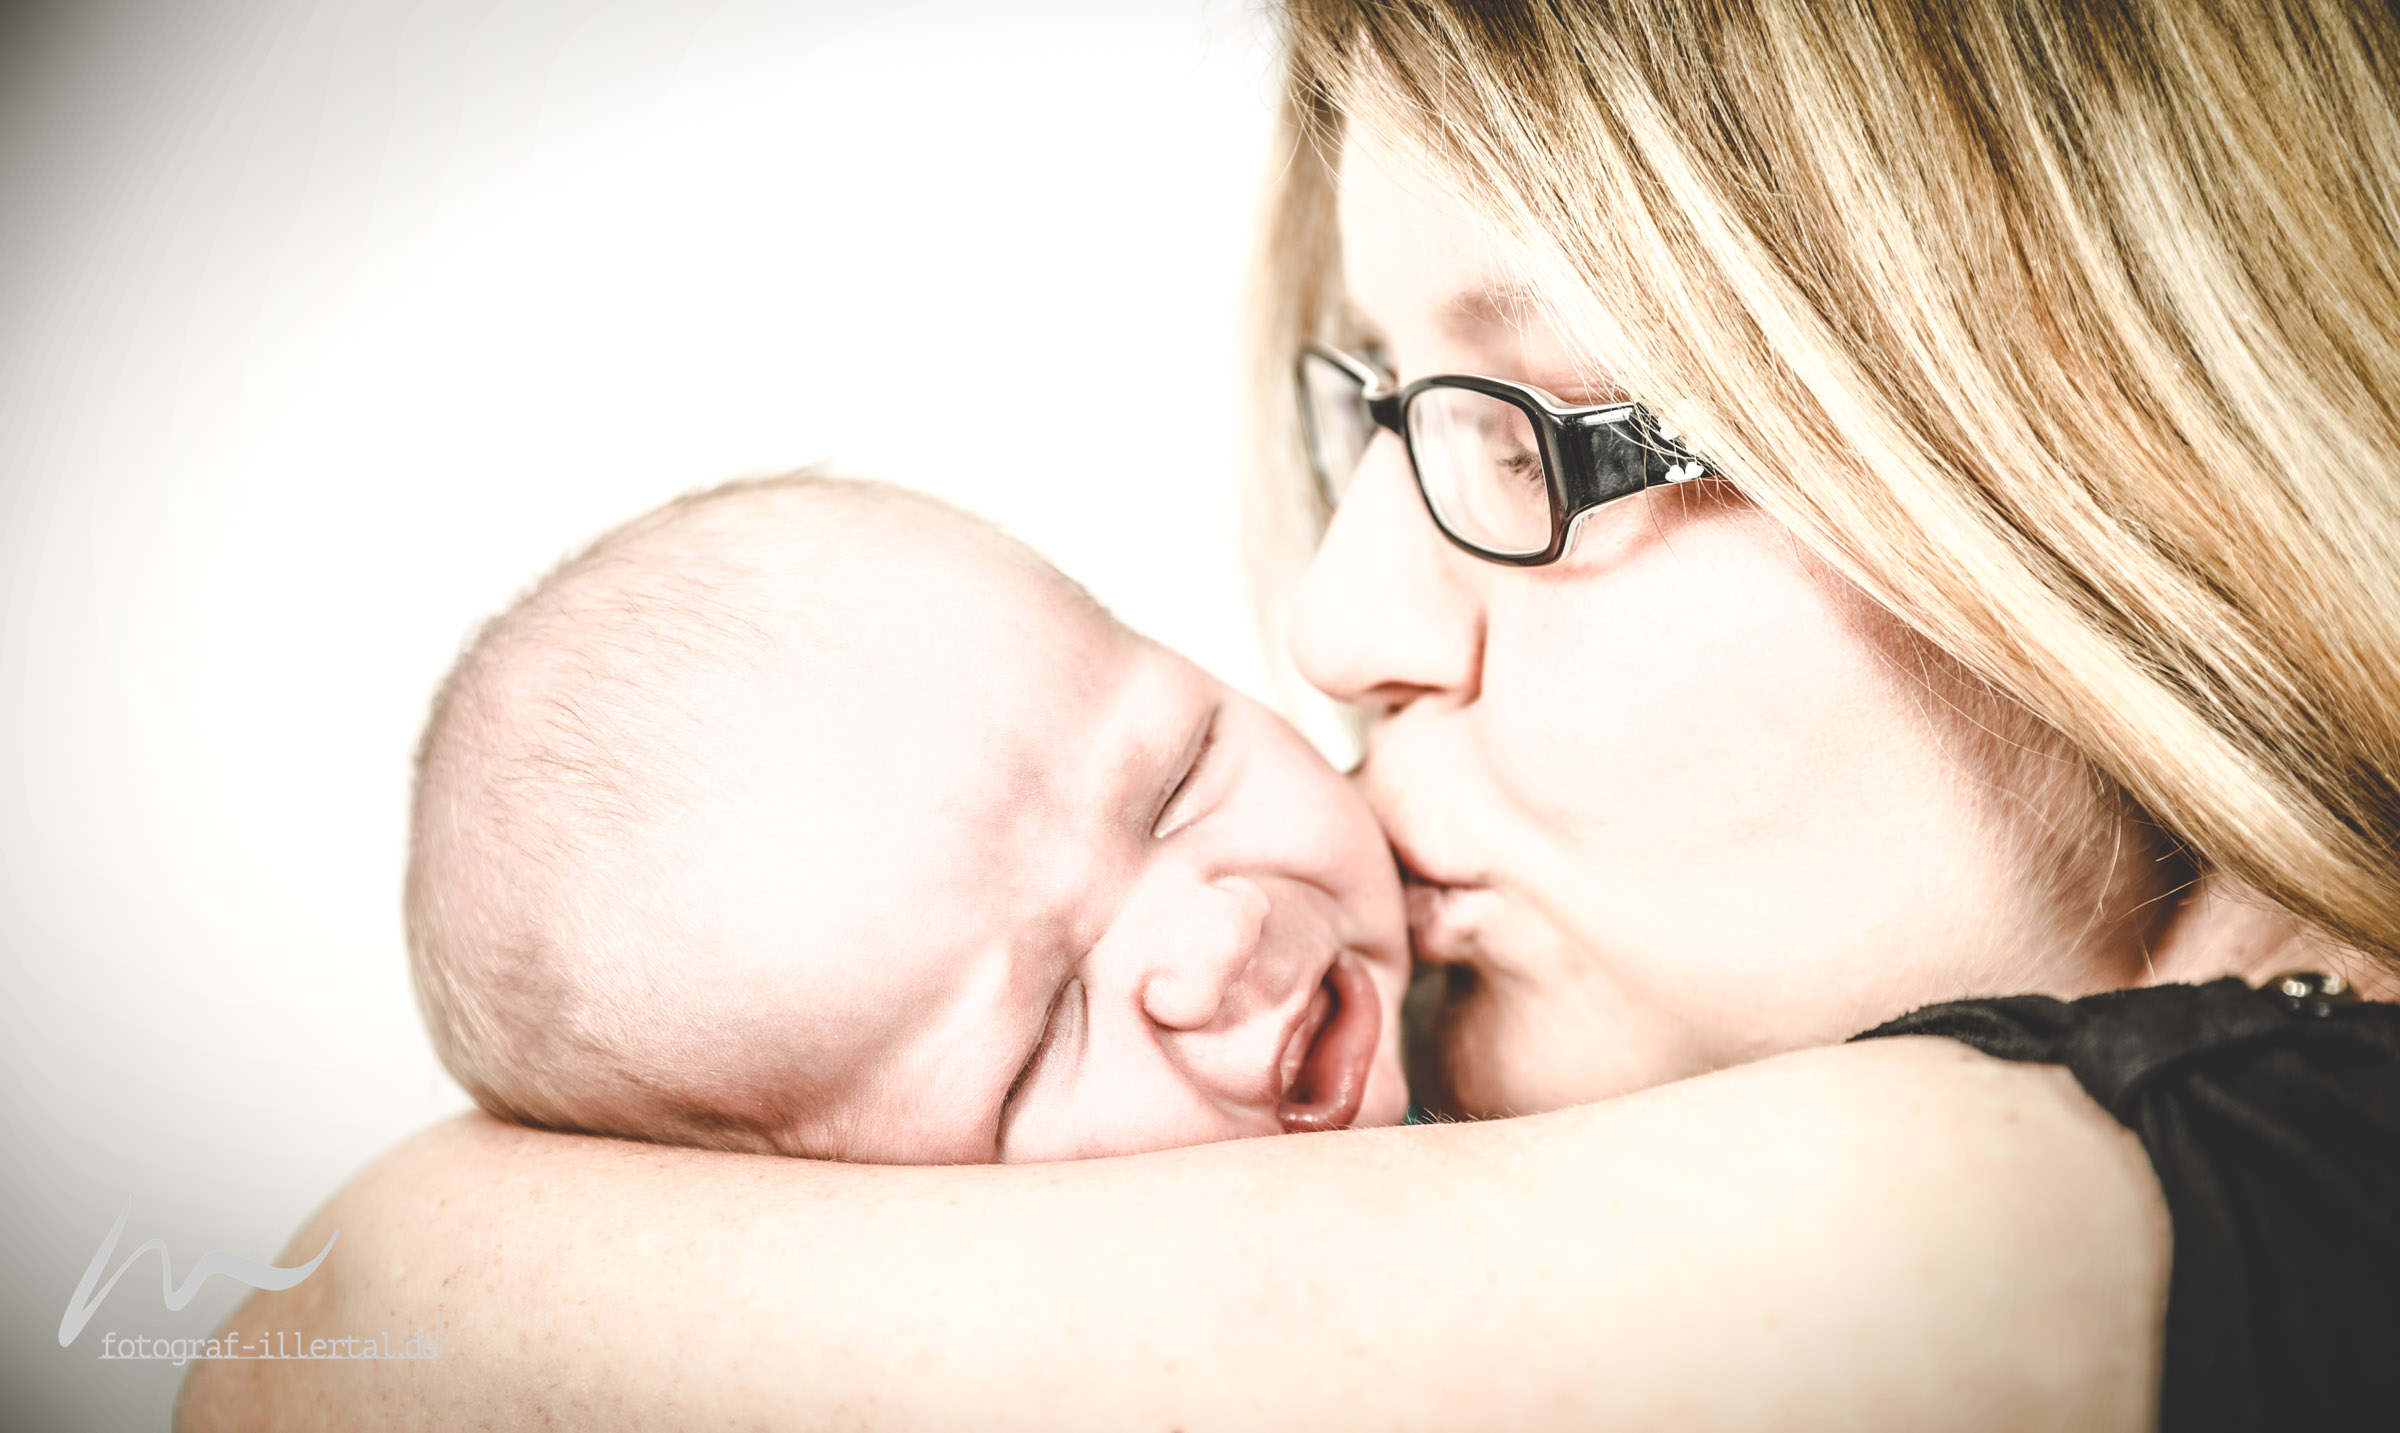 Fotograf Illertal-Christian Miller-Kinderfotos-Familienfotos-_MG_8316